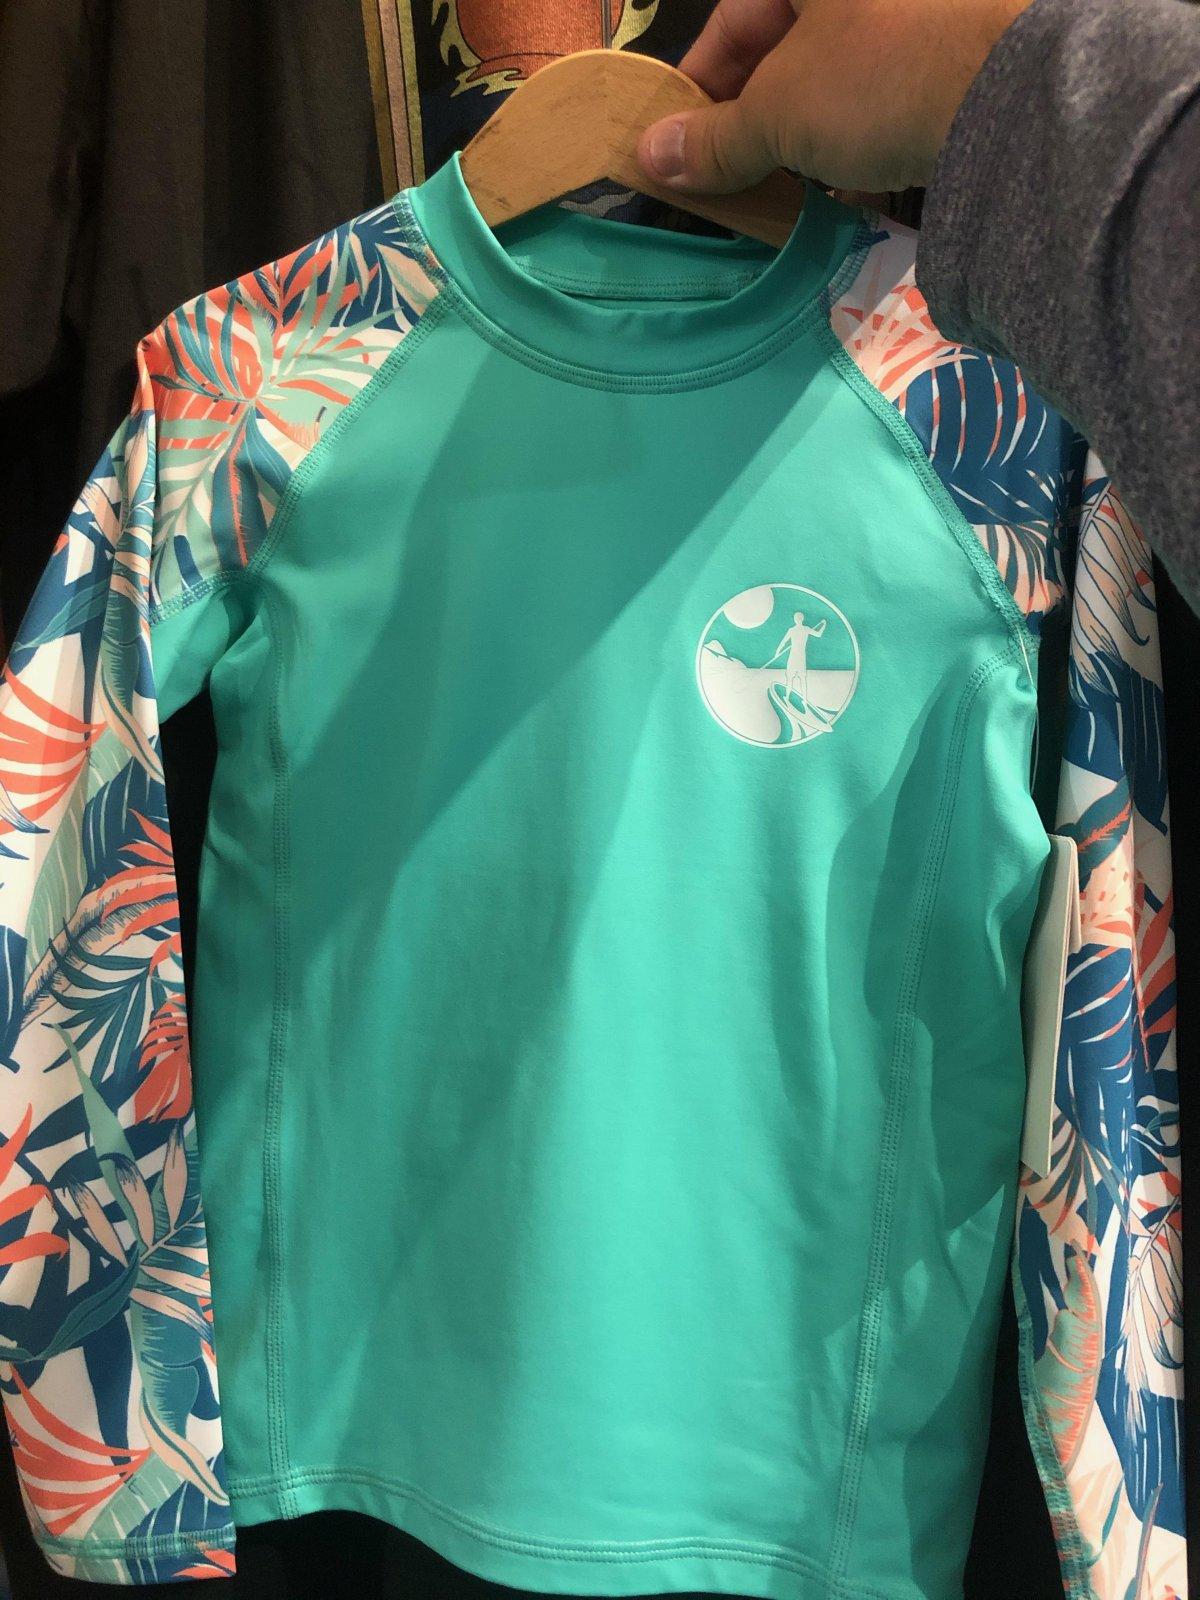 UK L/S Girl's Sun Shirt Mint '21